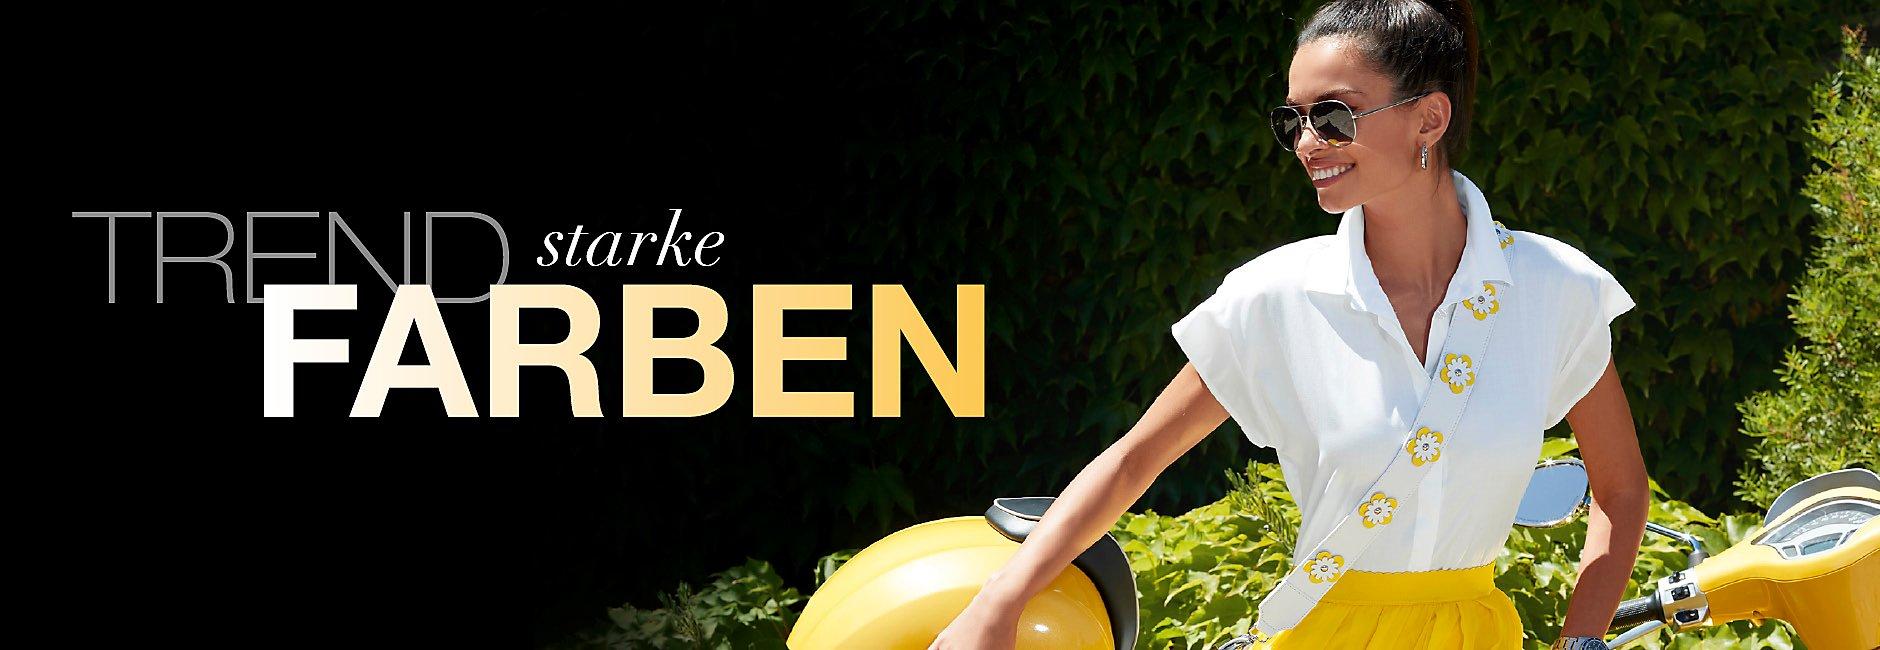 Trends 2018 - Power Farben